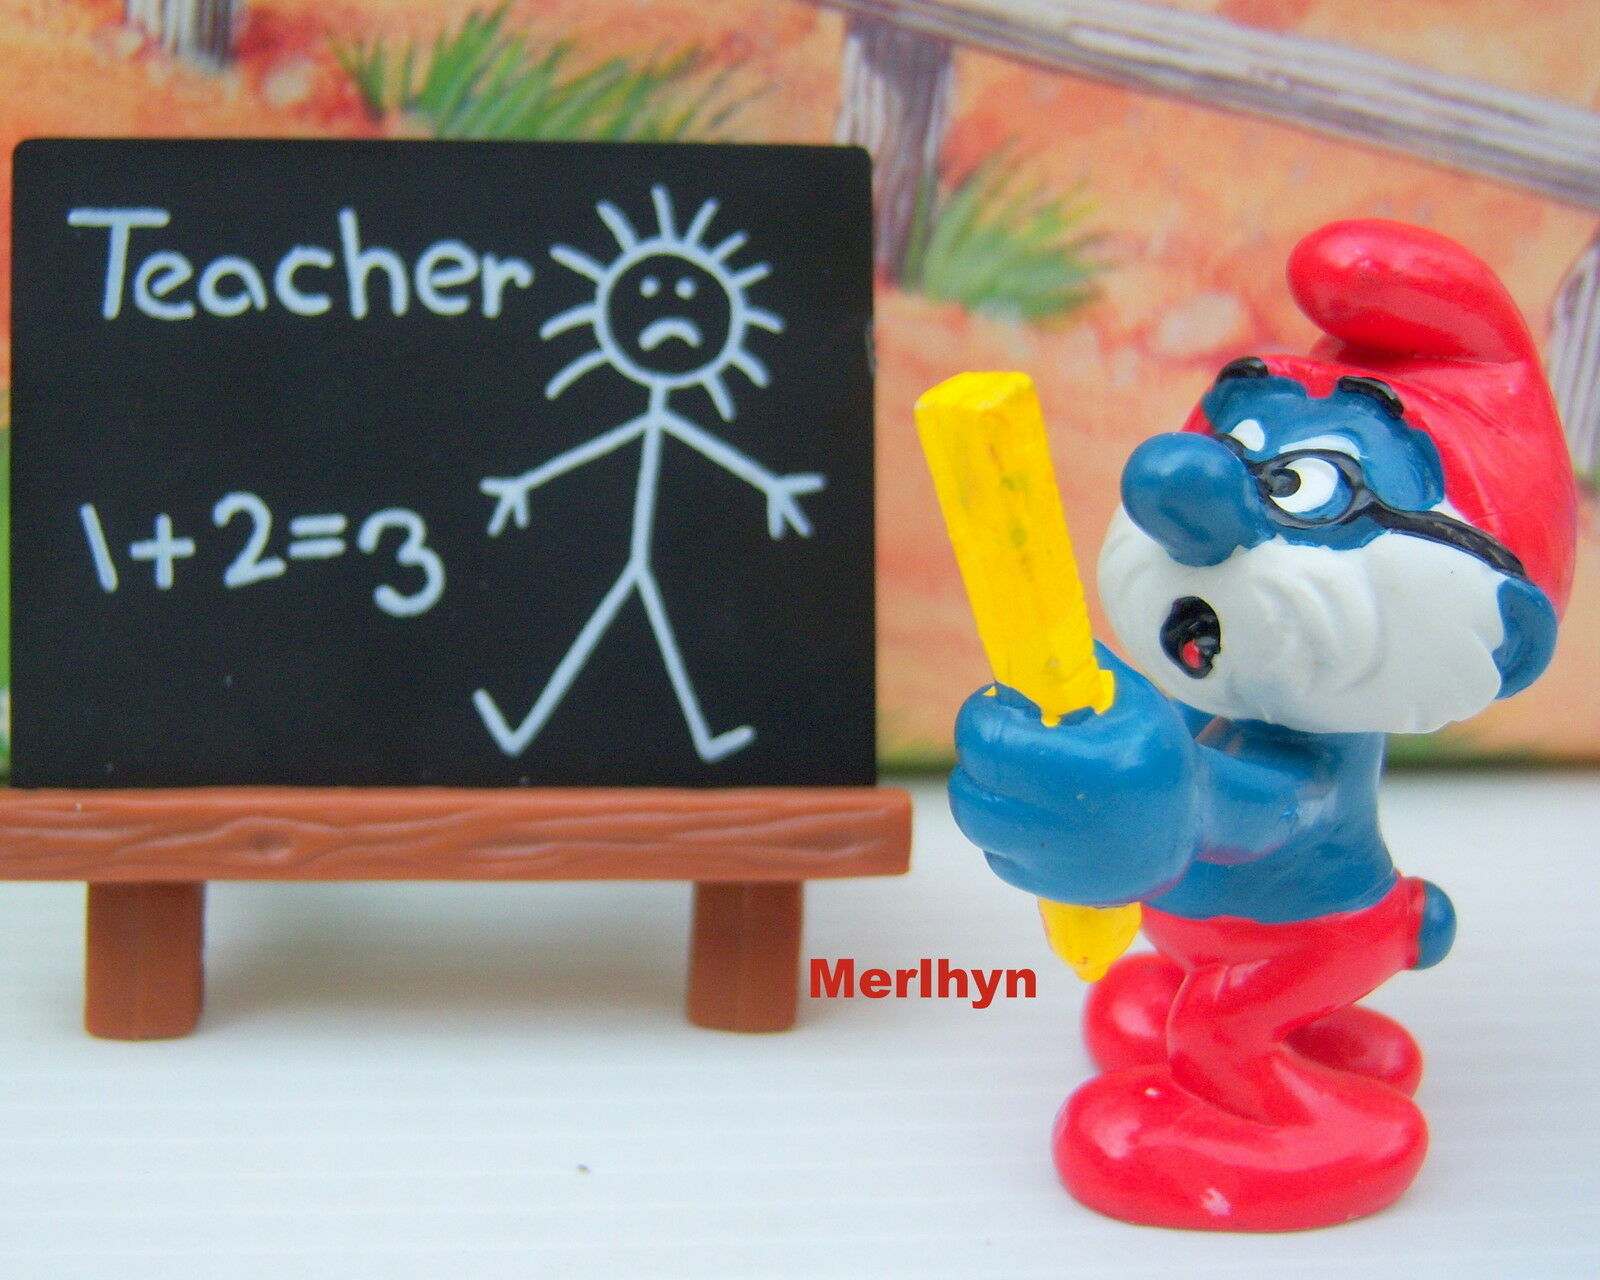 40224 Schtroumpf tableau ecole teacher smurf school puffo puffi pitufo raris.HK